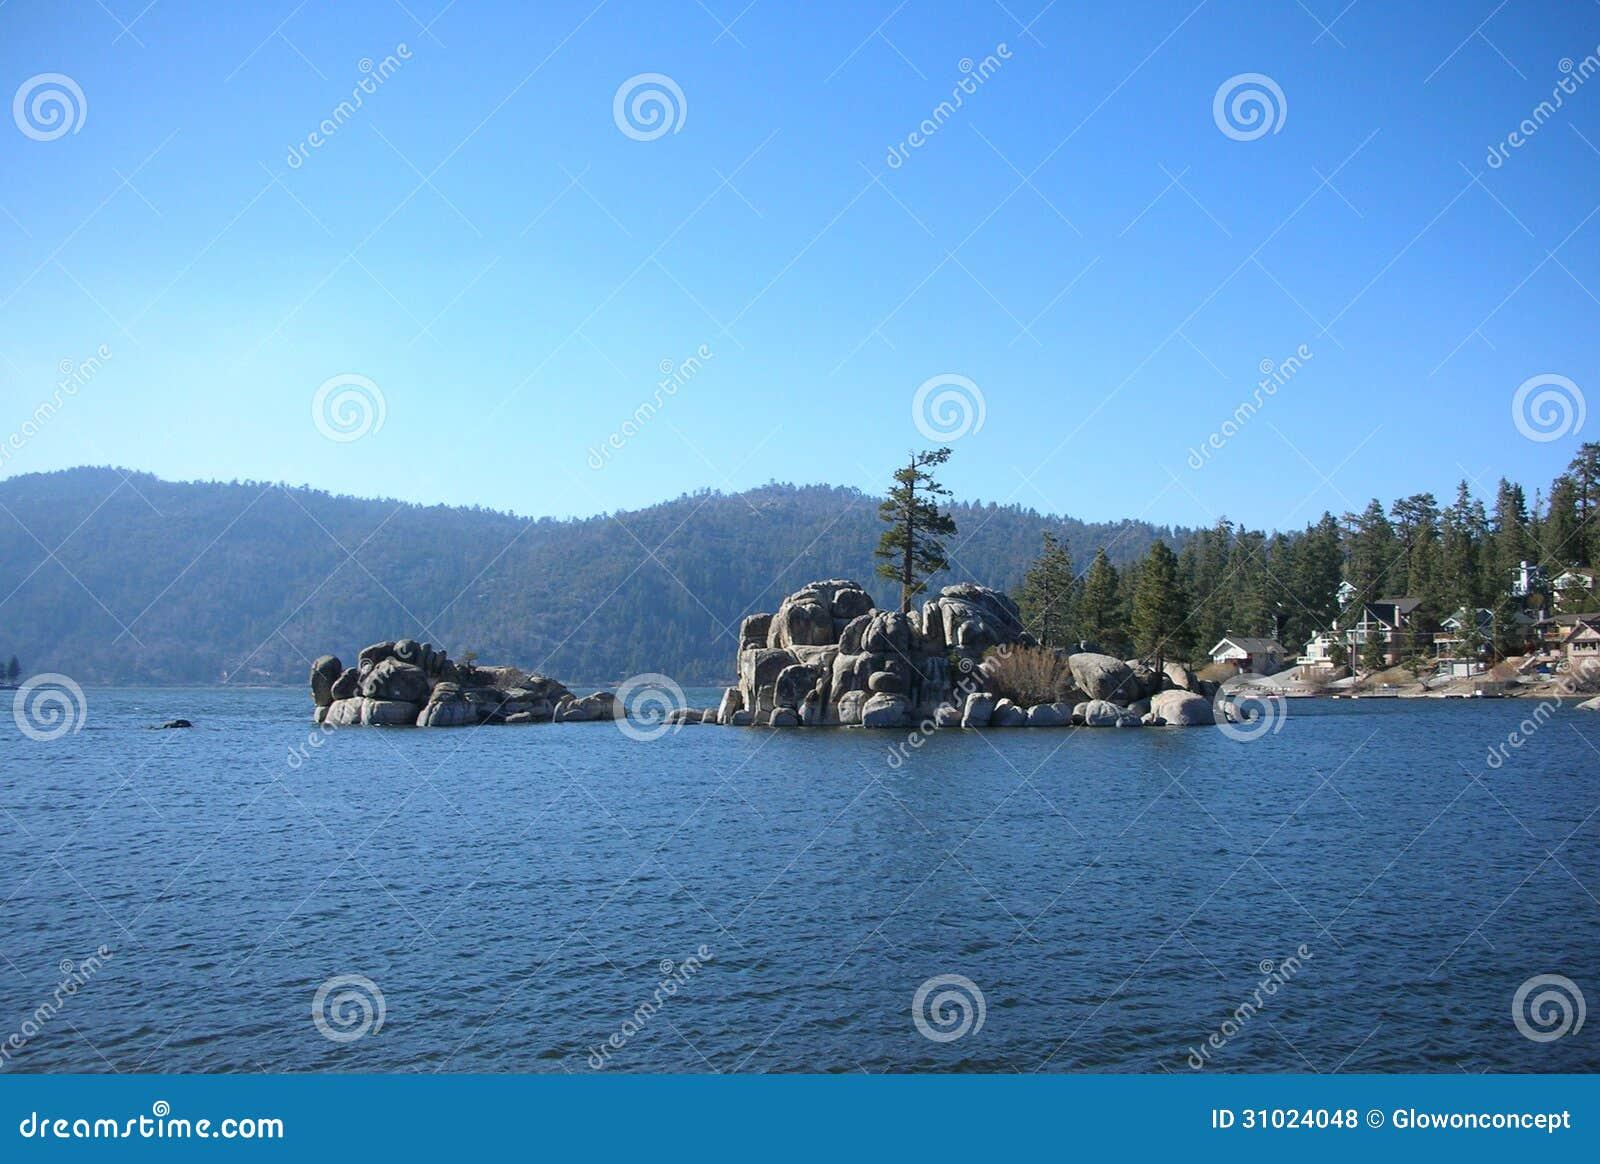 Big bear lake , lake in the mountain